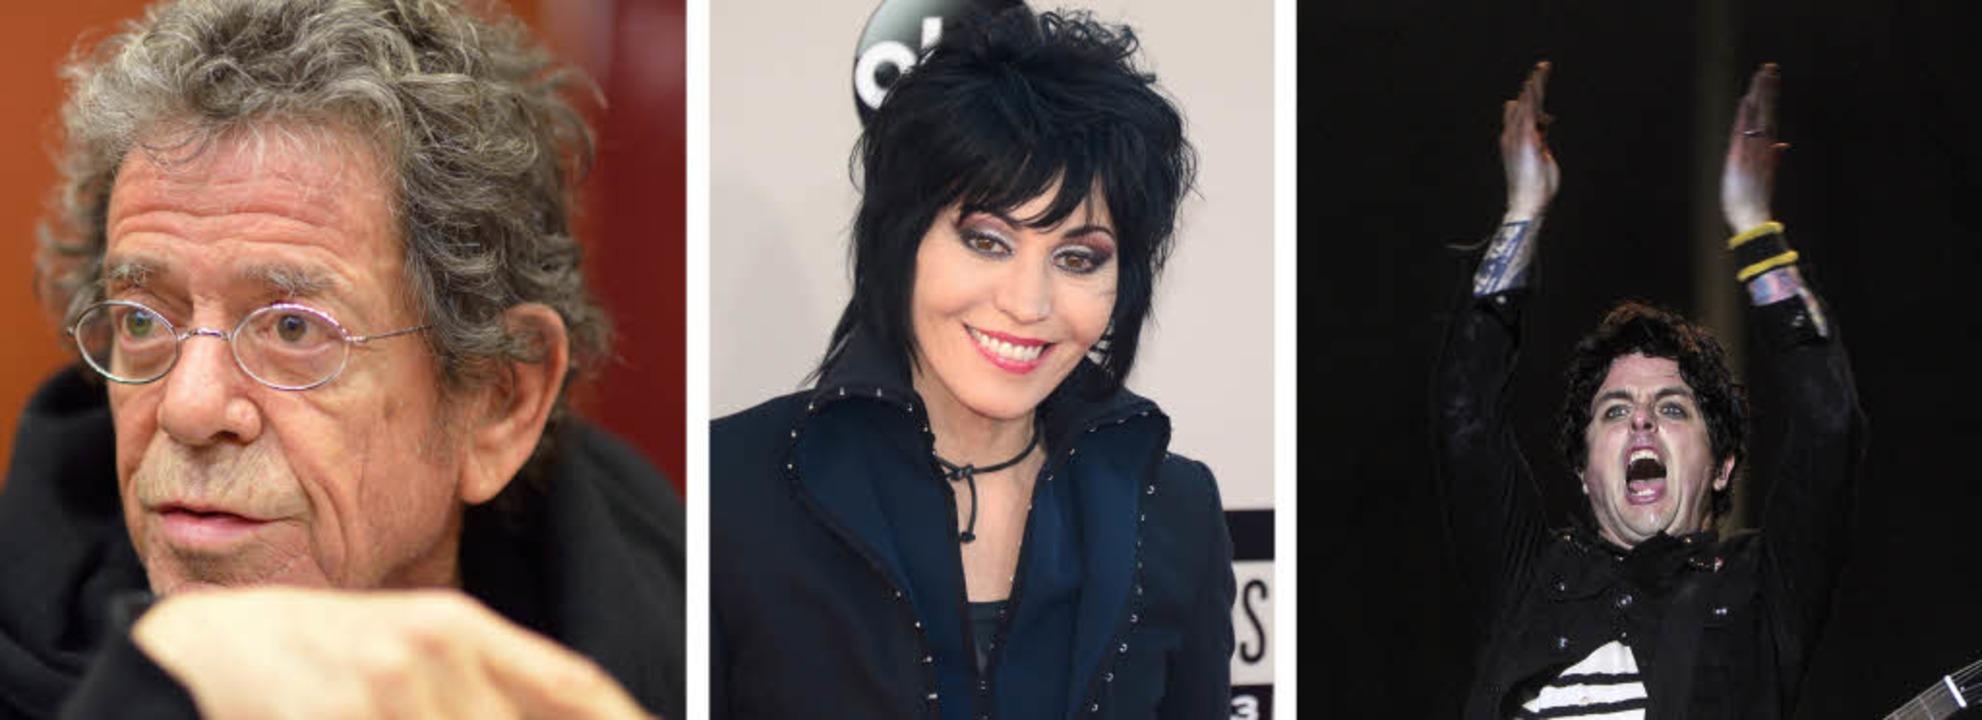 Lou Reed, Joan Jett und Billie Joe Arm...' Roll-Hall of Fame aufgenommen.  | Foto: AFP